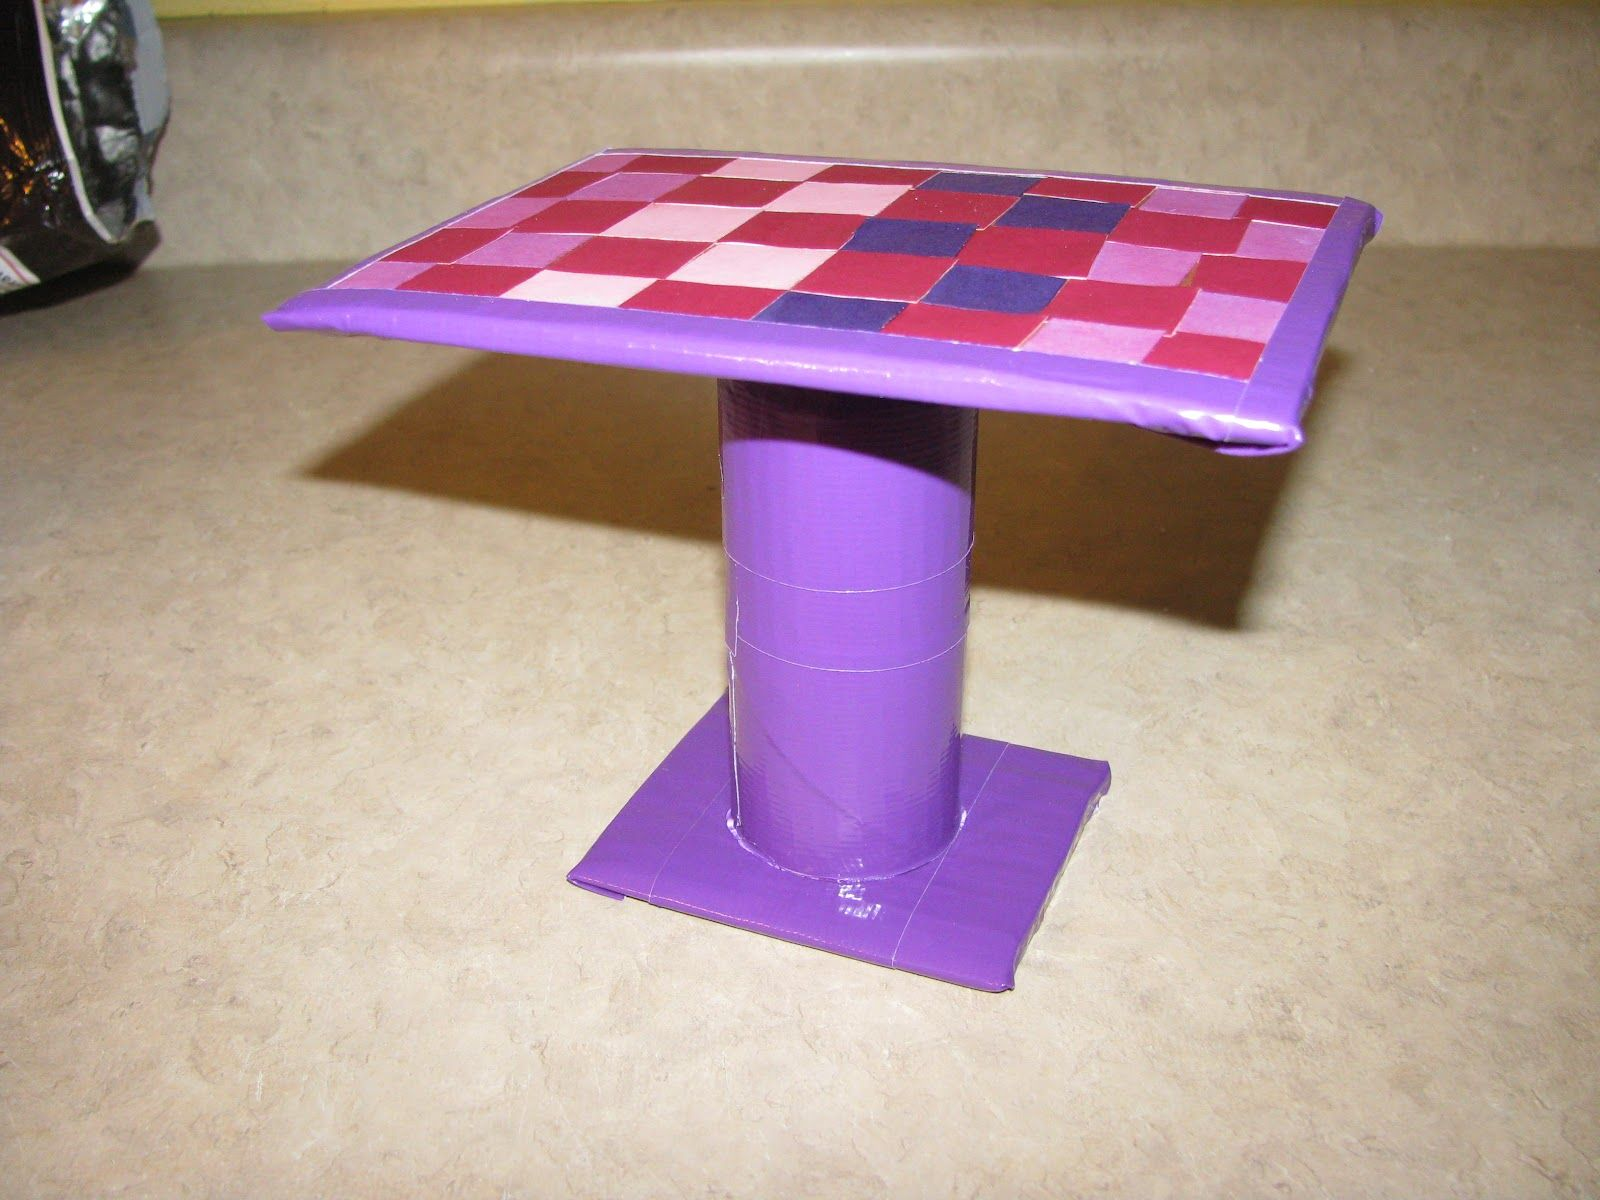 homemade barbie furniture. Wonderful Barbie Homemade Barbie Furniture  The Dining Table Is Also Just Cardboard Duct  Tape Toilet Throughout 3